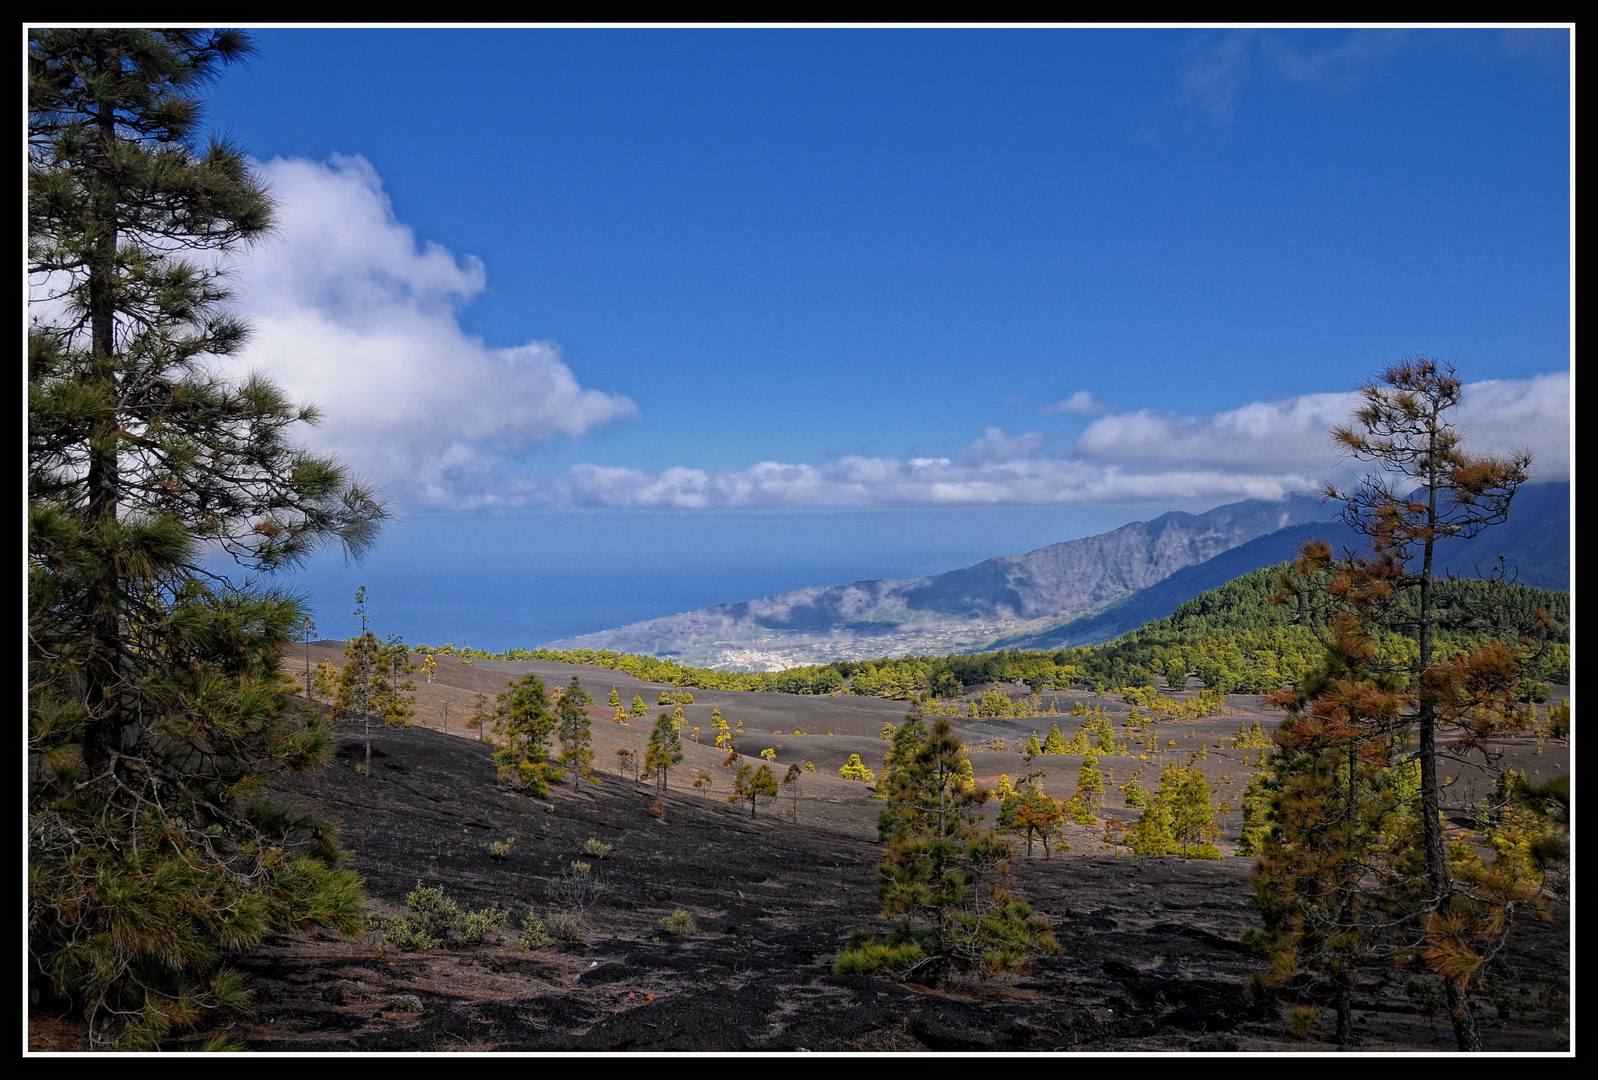 La Palma - Mirador